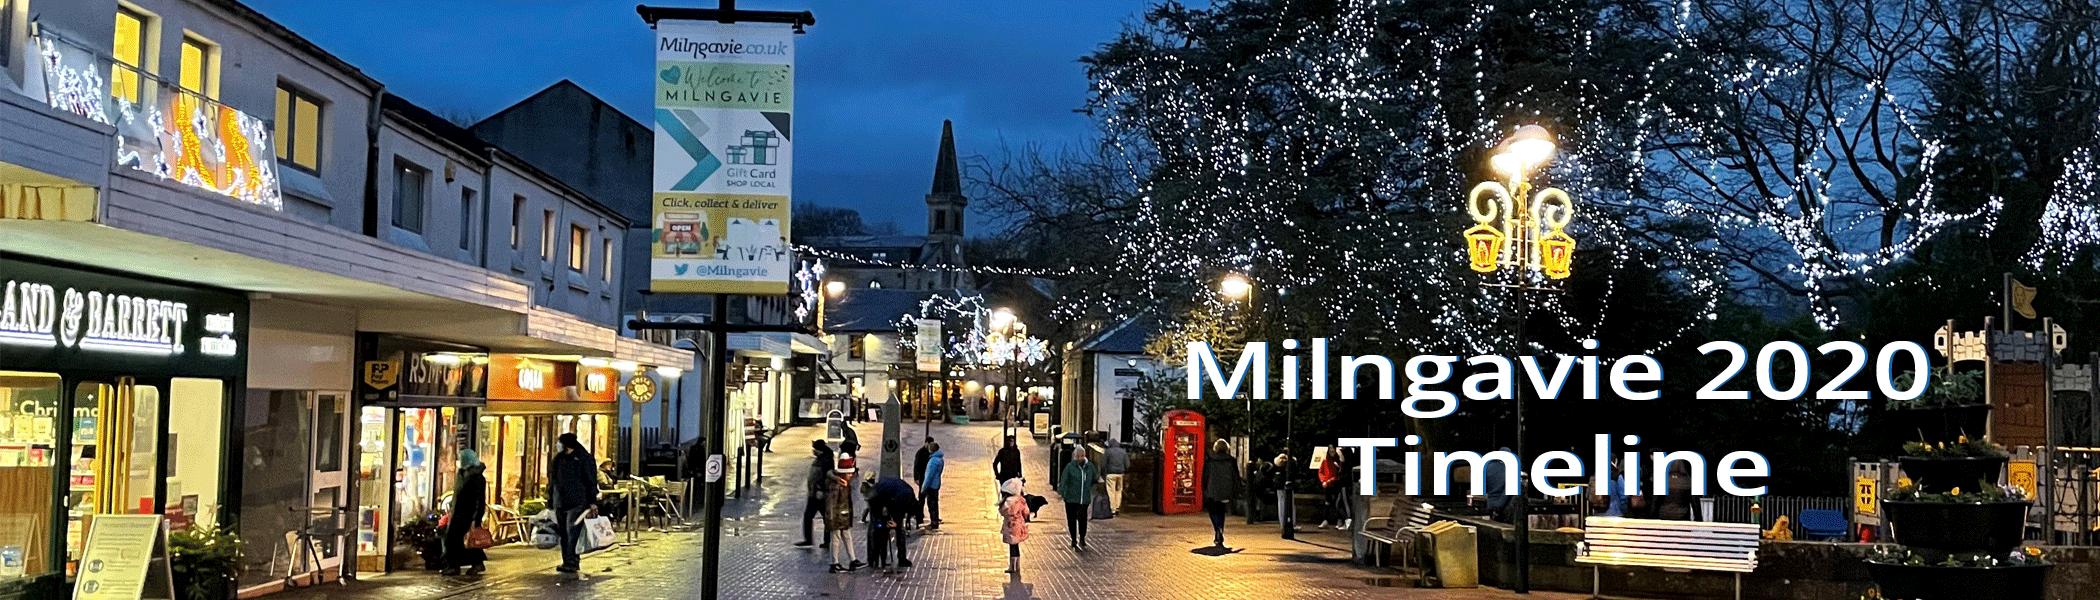 Milngavie 2020 Timeline